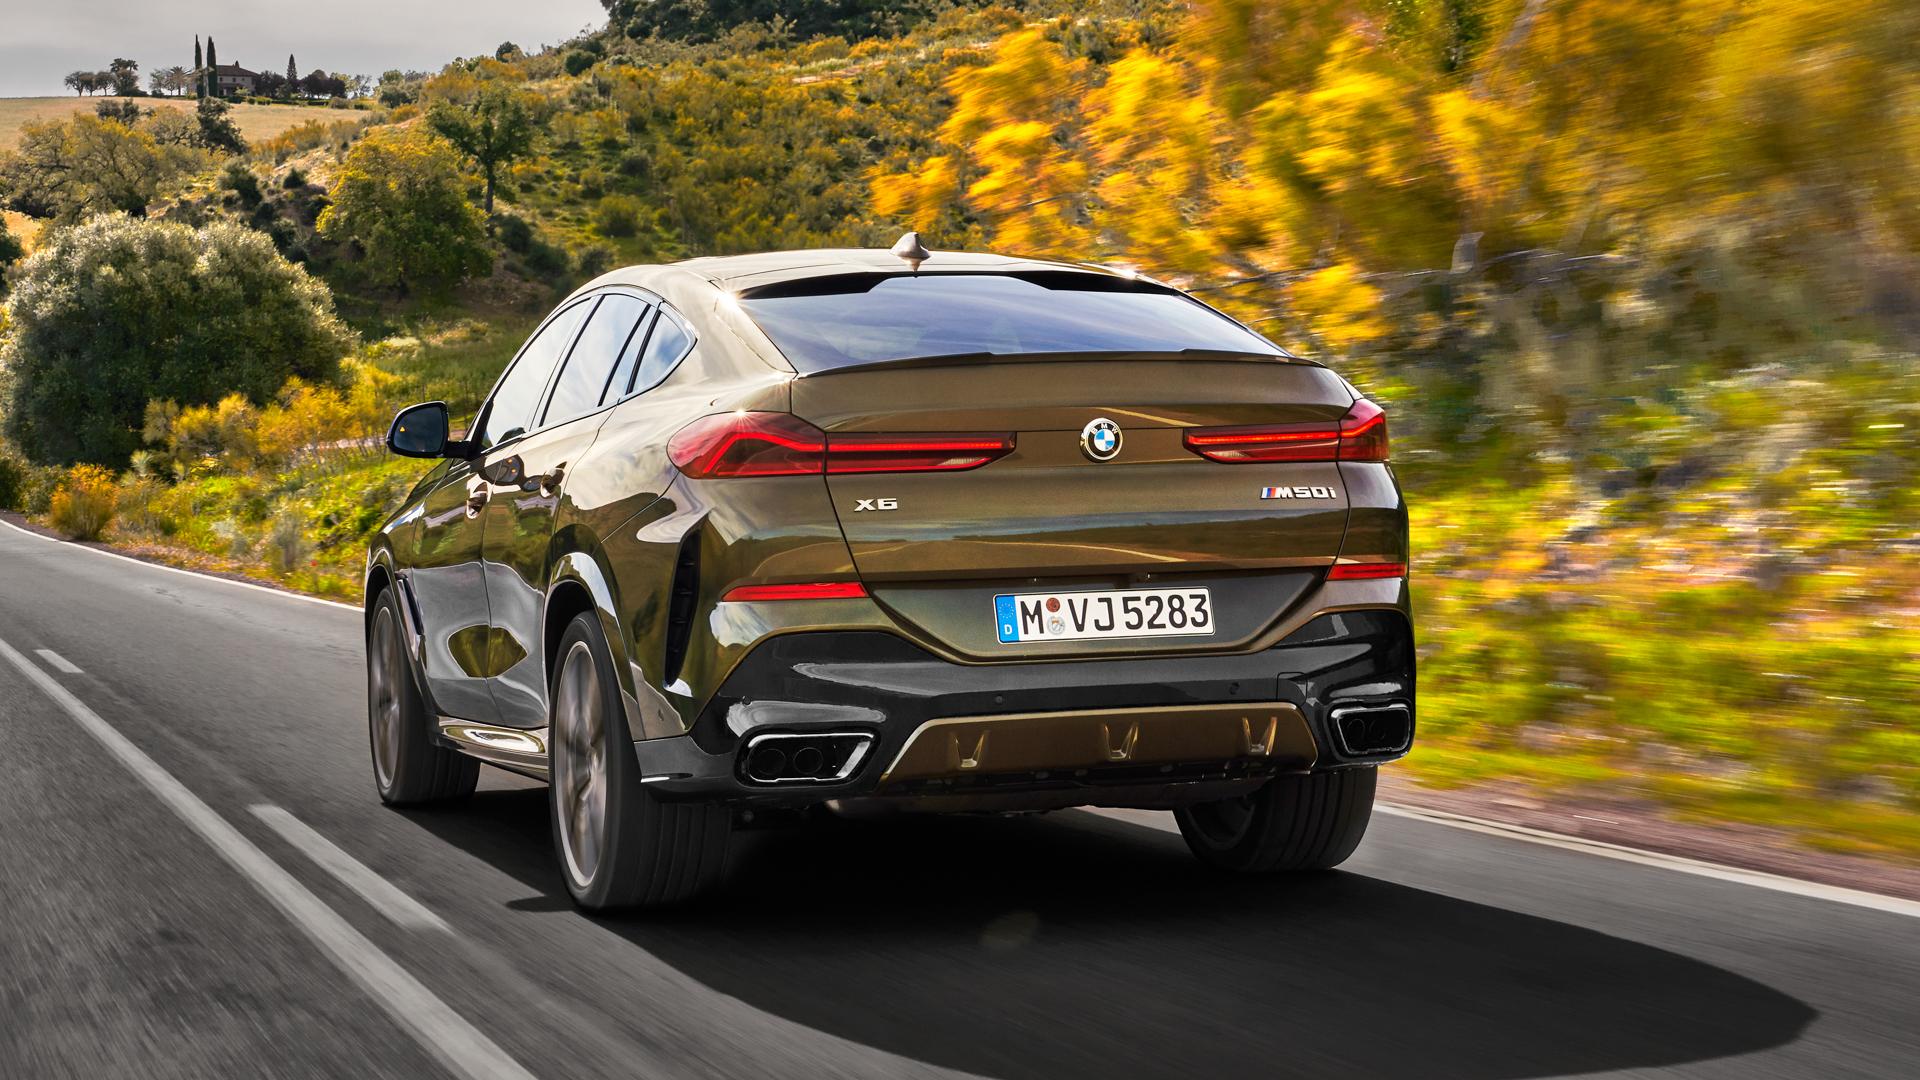 Photo Comparison Bmw X6 M50i Vs Mercedes Amg Gle 53 Coupe